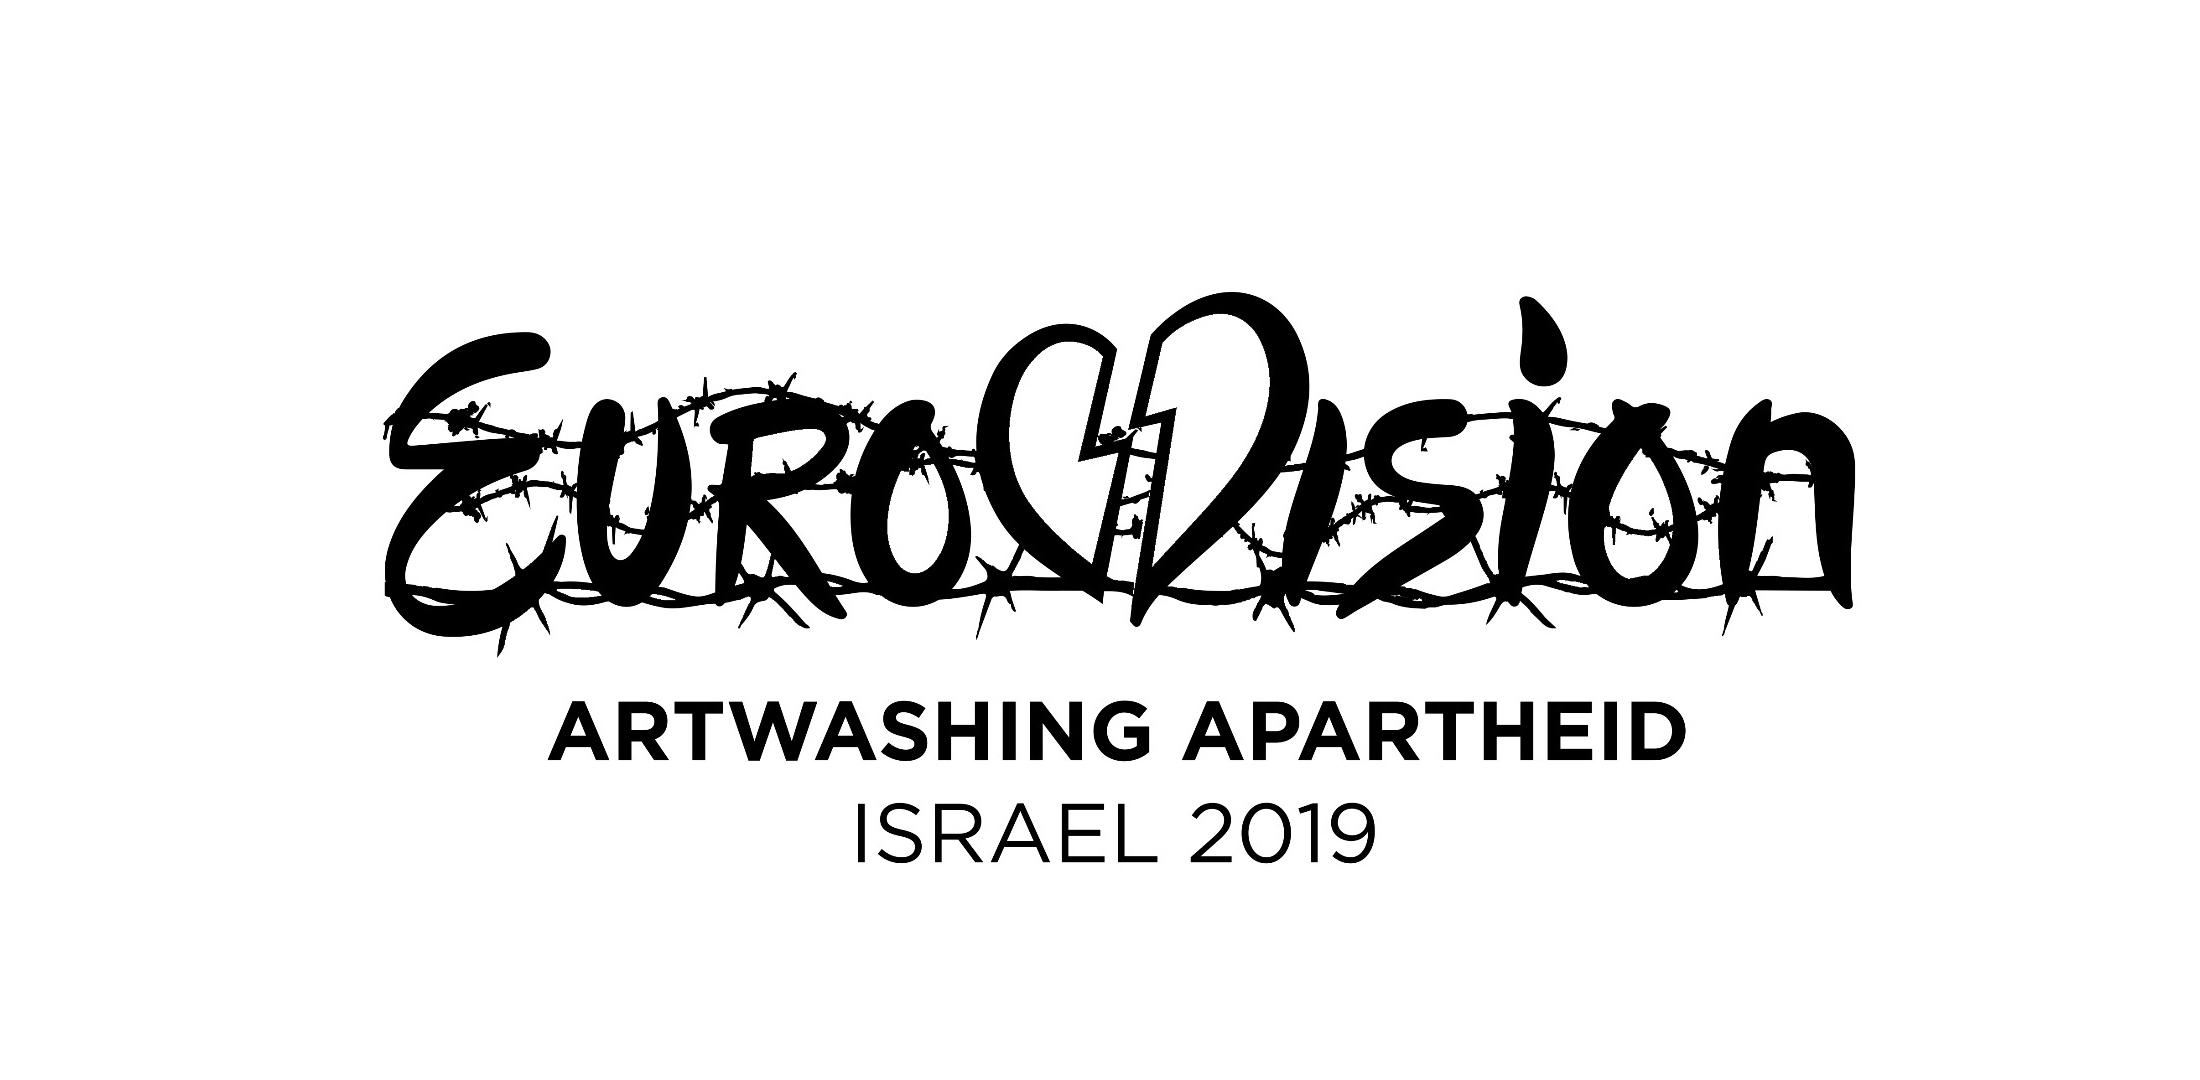 SBS 2018 Eurovision judge L-FRESH The LION joins Israel boycott